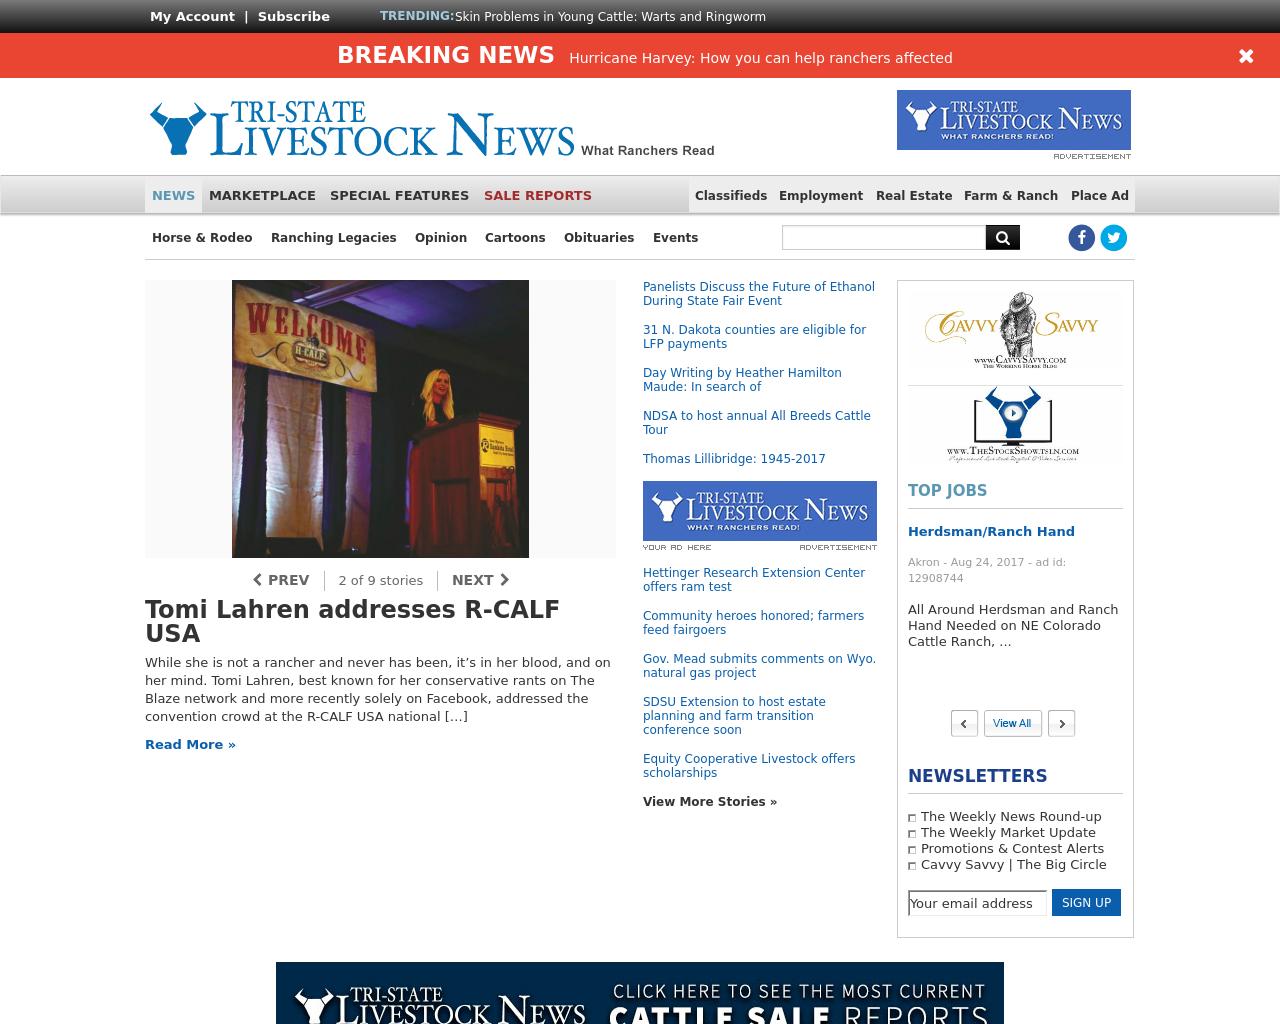 Tri-State-Livestock-News-Advertising-Reviews-Pricing